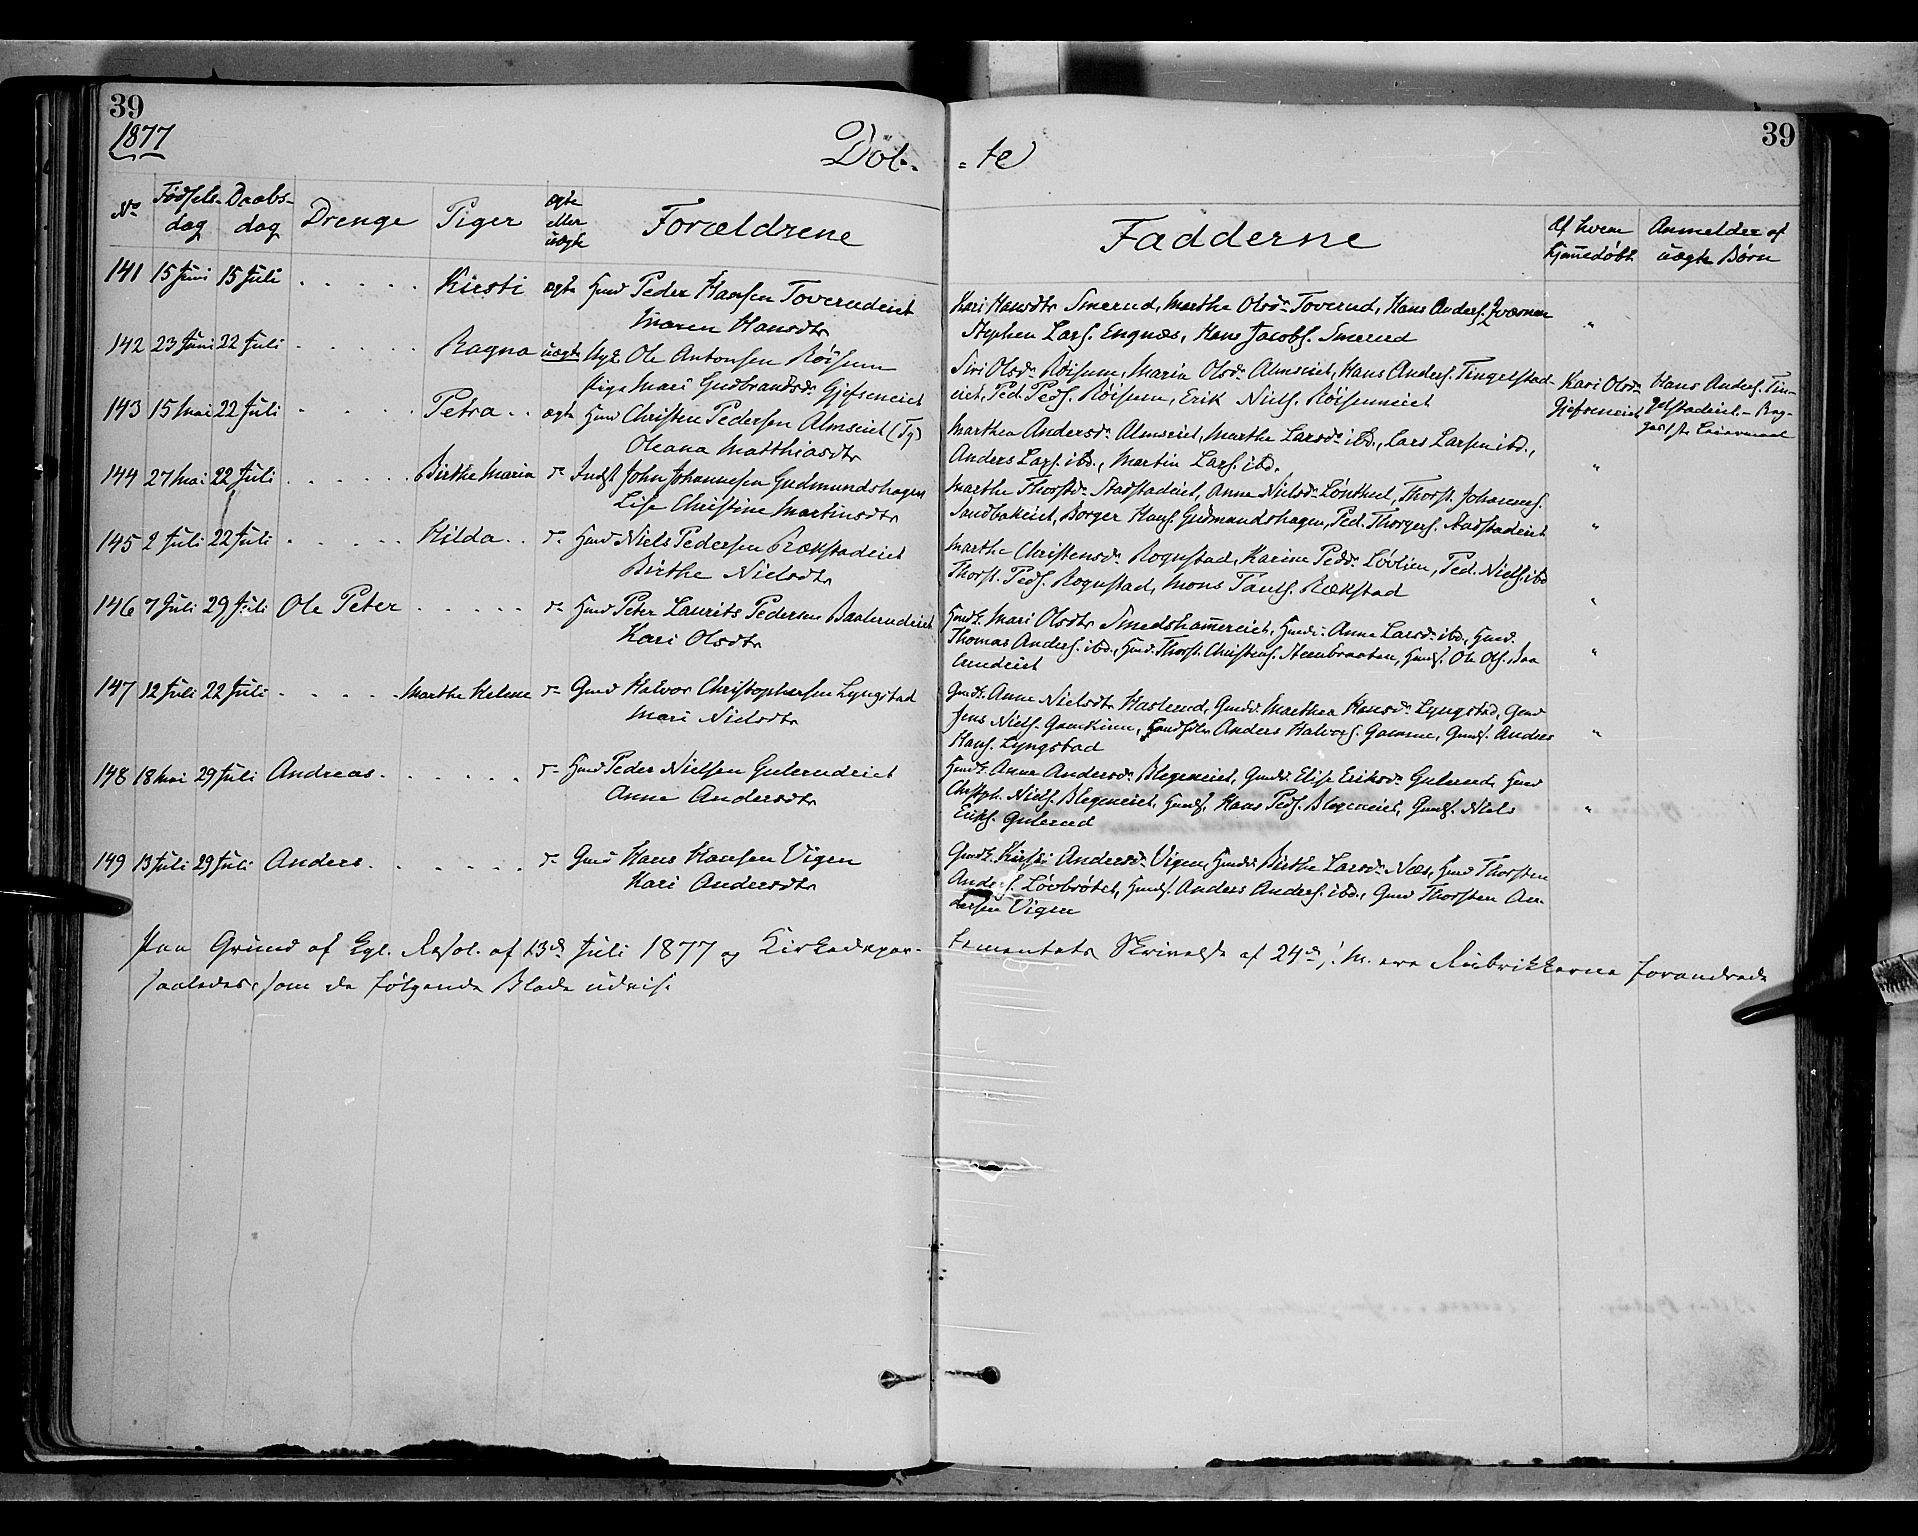 SAH, Gran prestekontor, Ministerialbok nr. 13, 1875-1879, s. 39